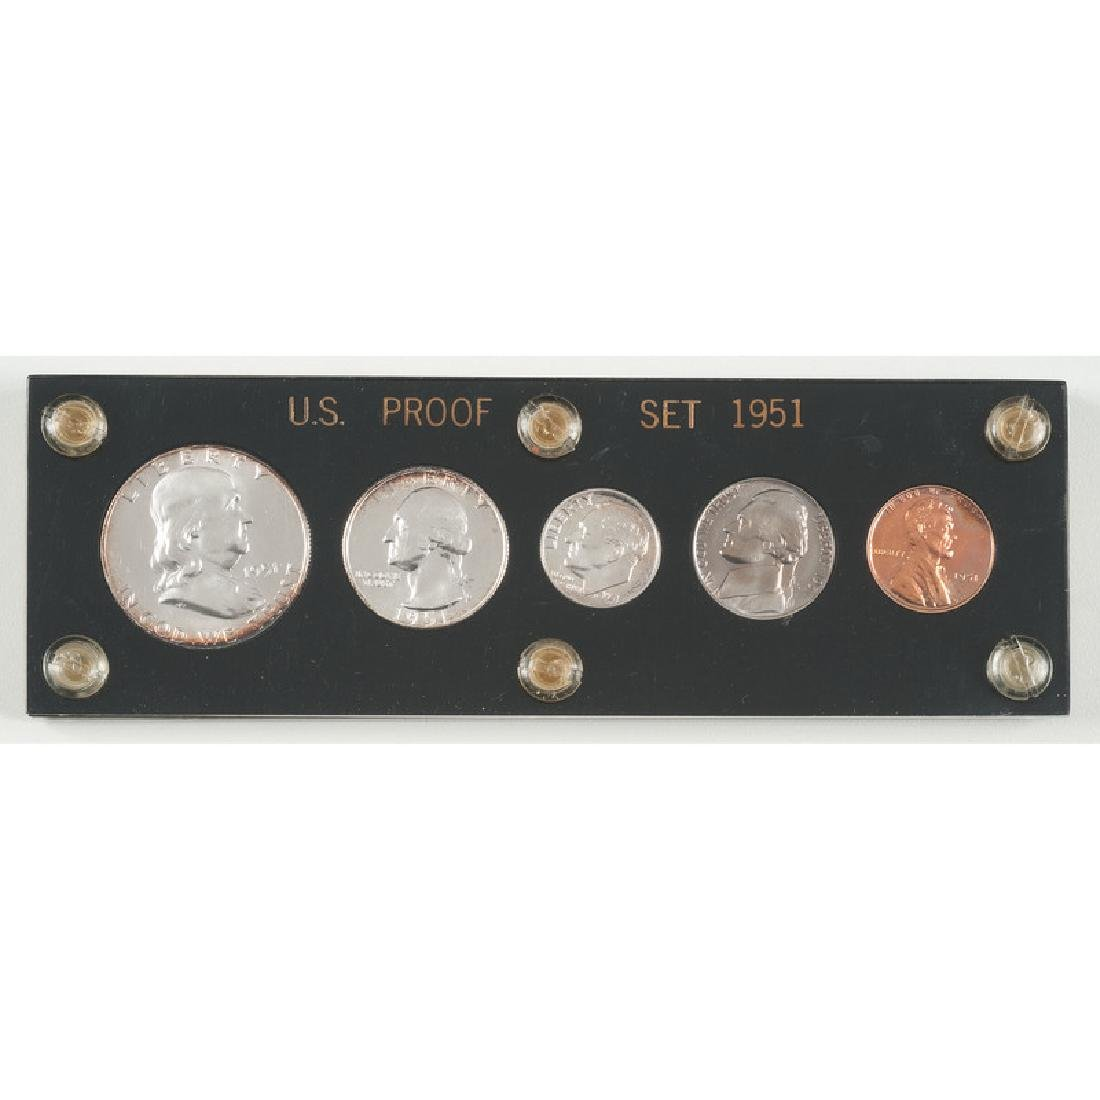 United States Proof Set 1951